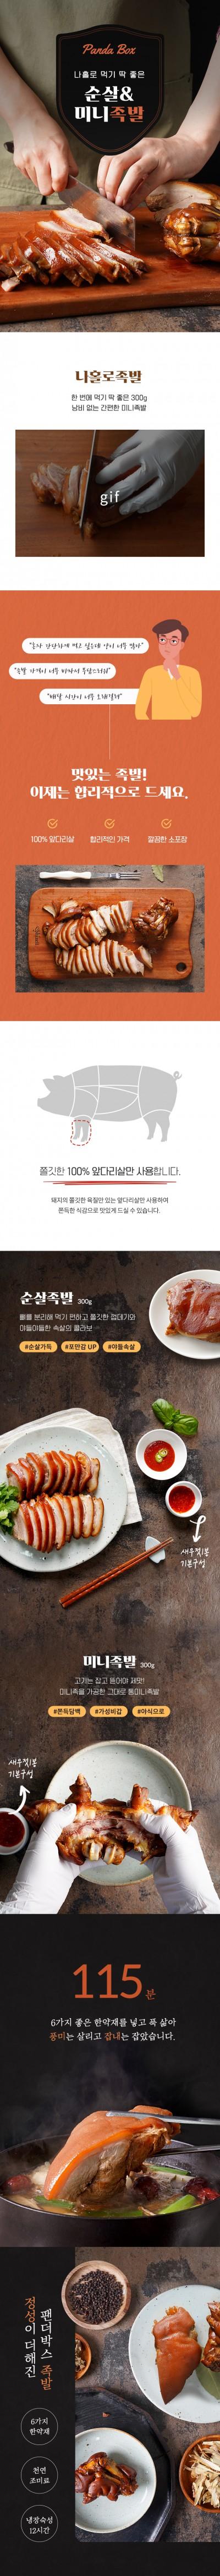 [D166]미니족발 상세페이지 제작+촬영